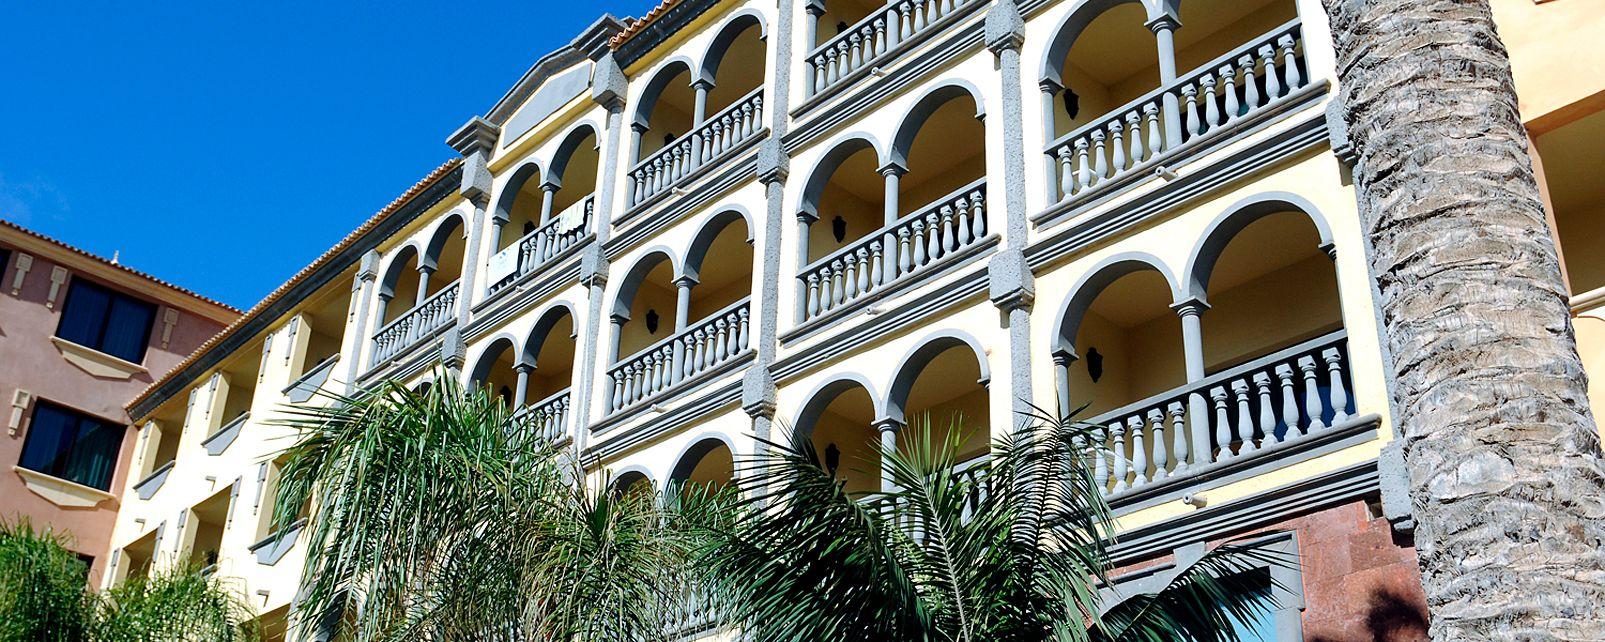 Hôtel R2 Rio Calma